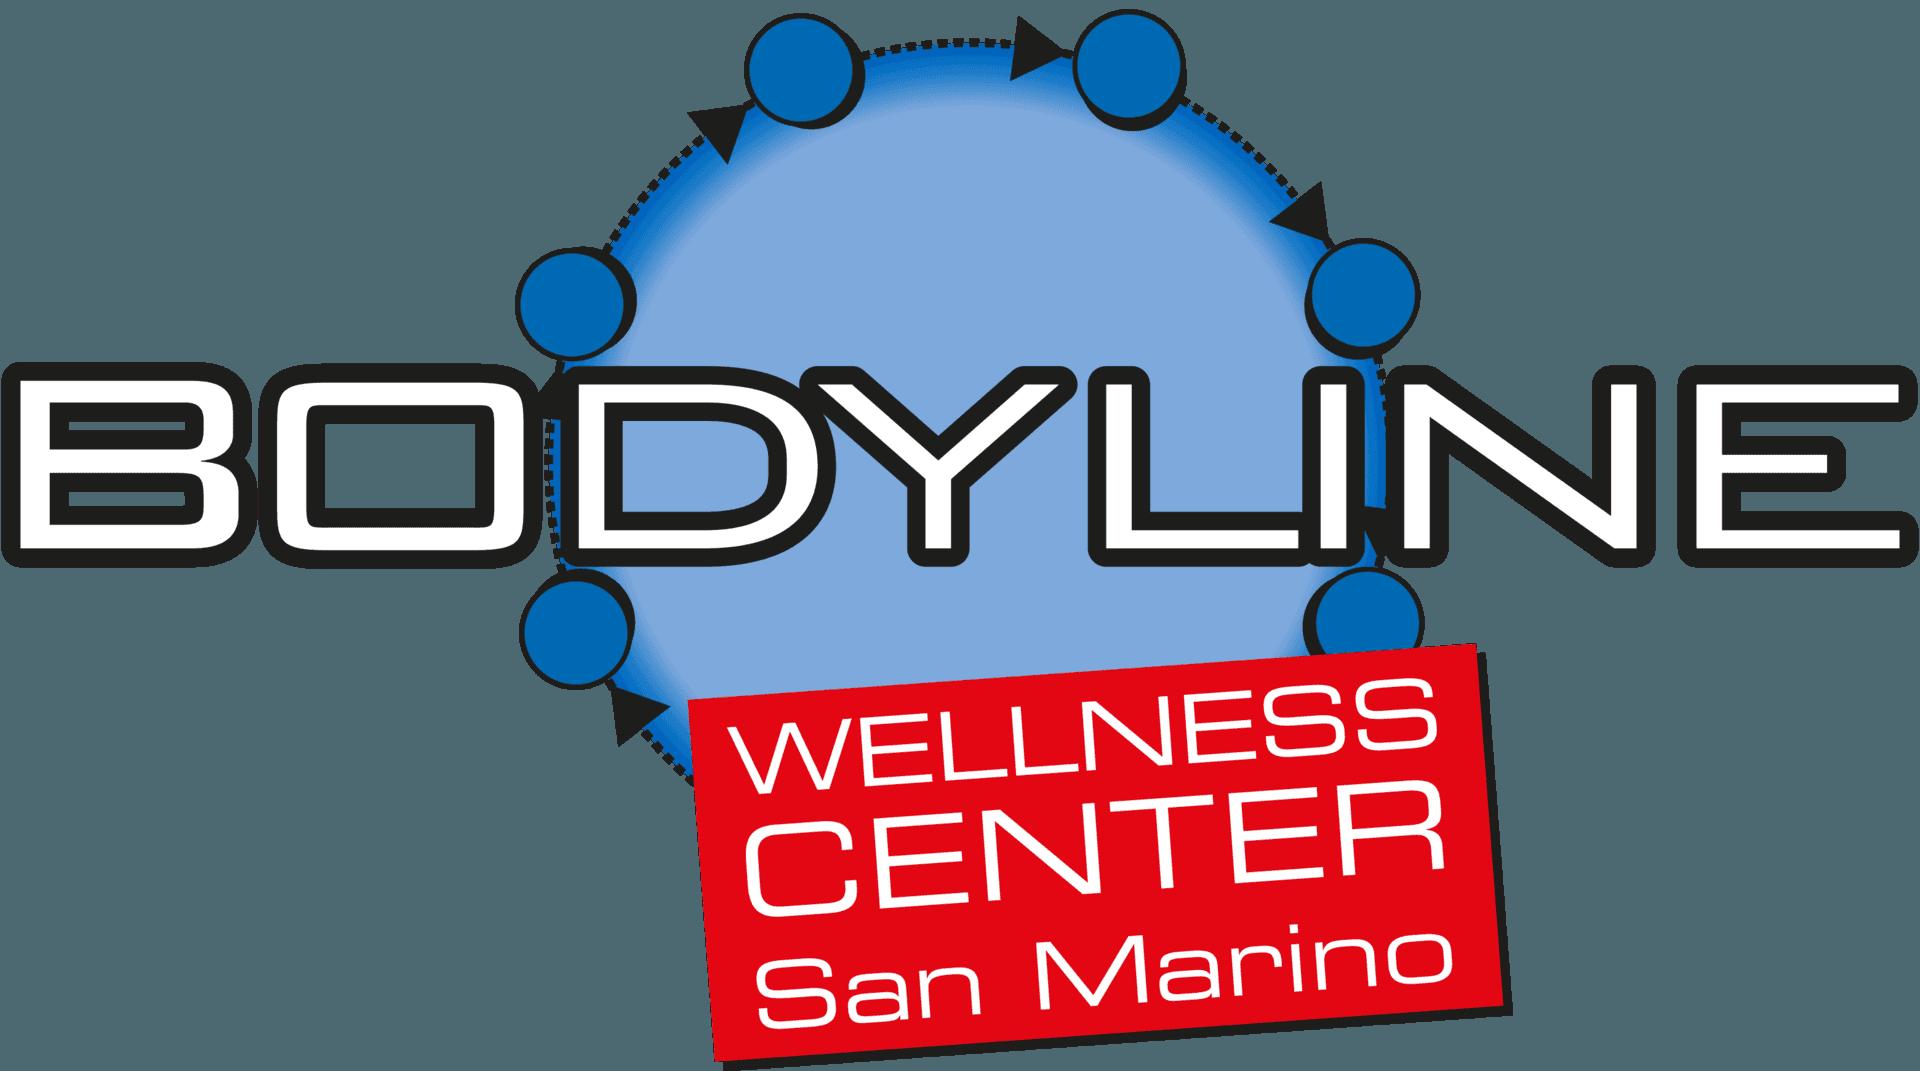 BODYLINE WELLNESS CENTER - LOGO